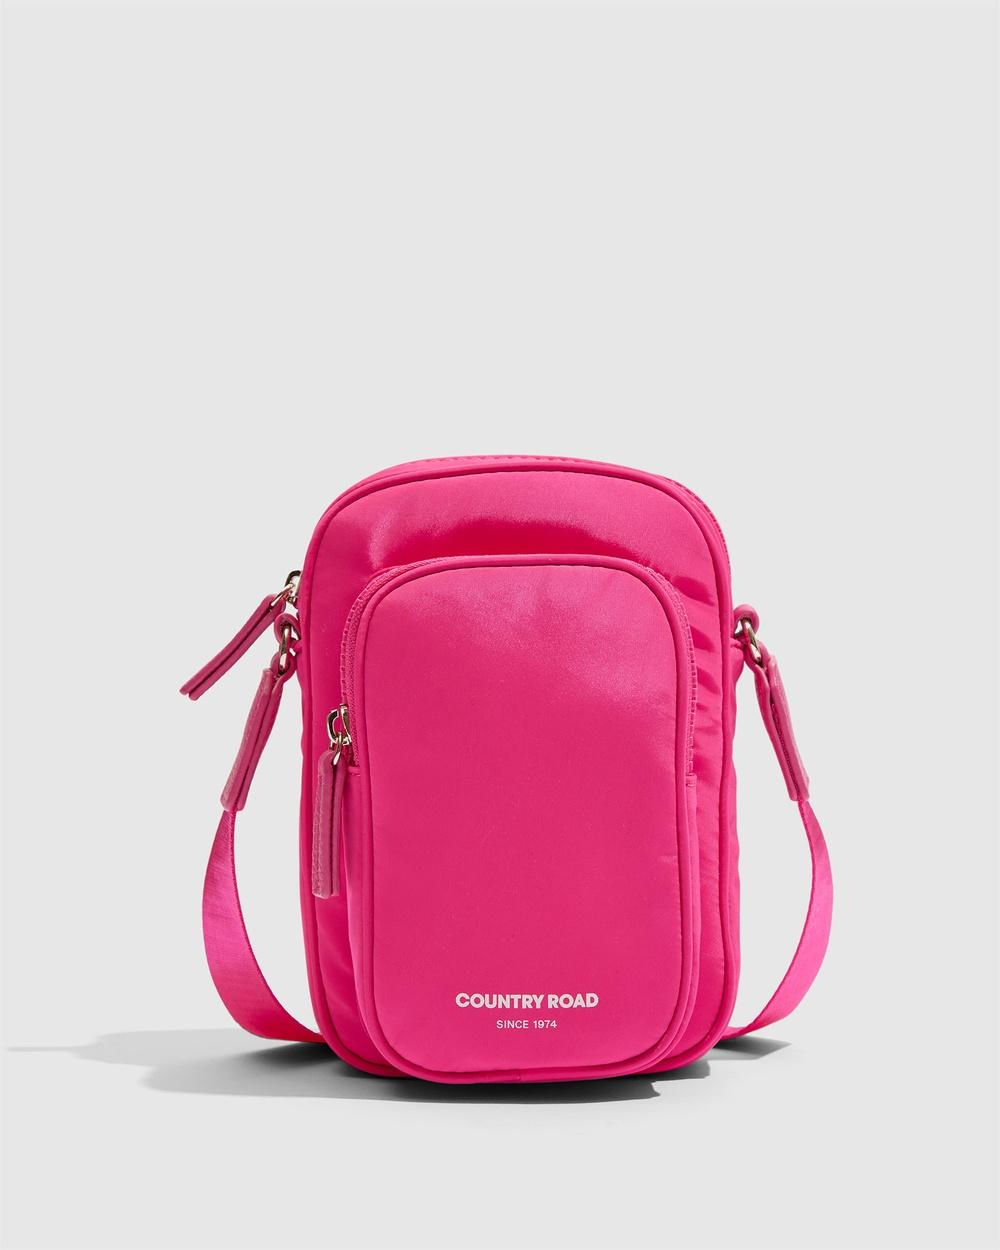 Country Road Soft Mini Bag Bags purple